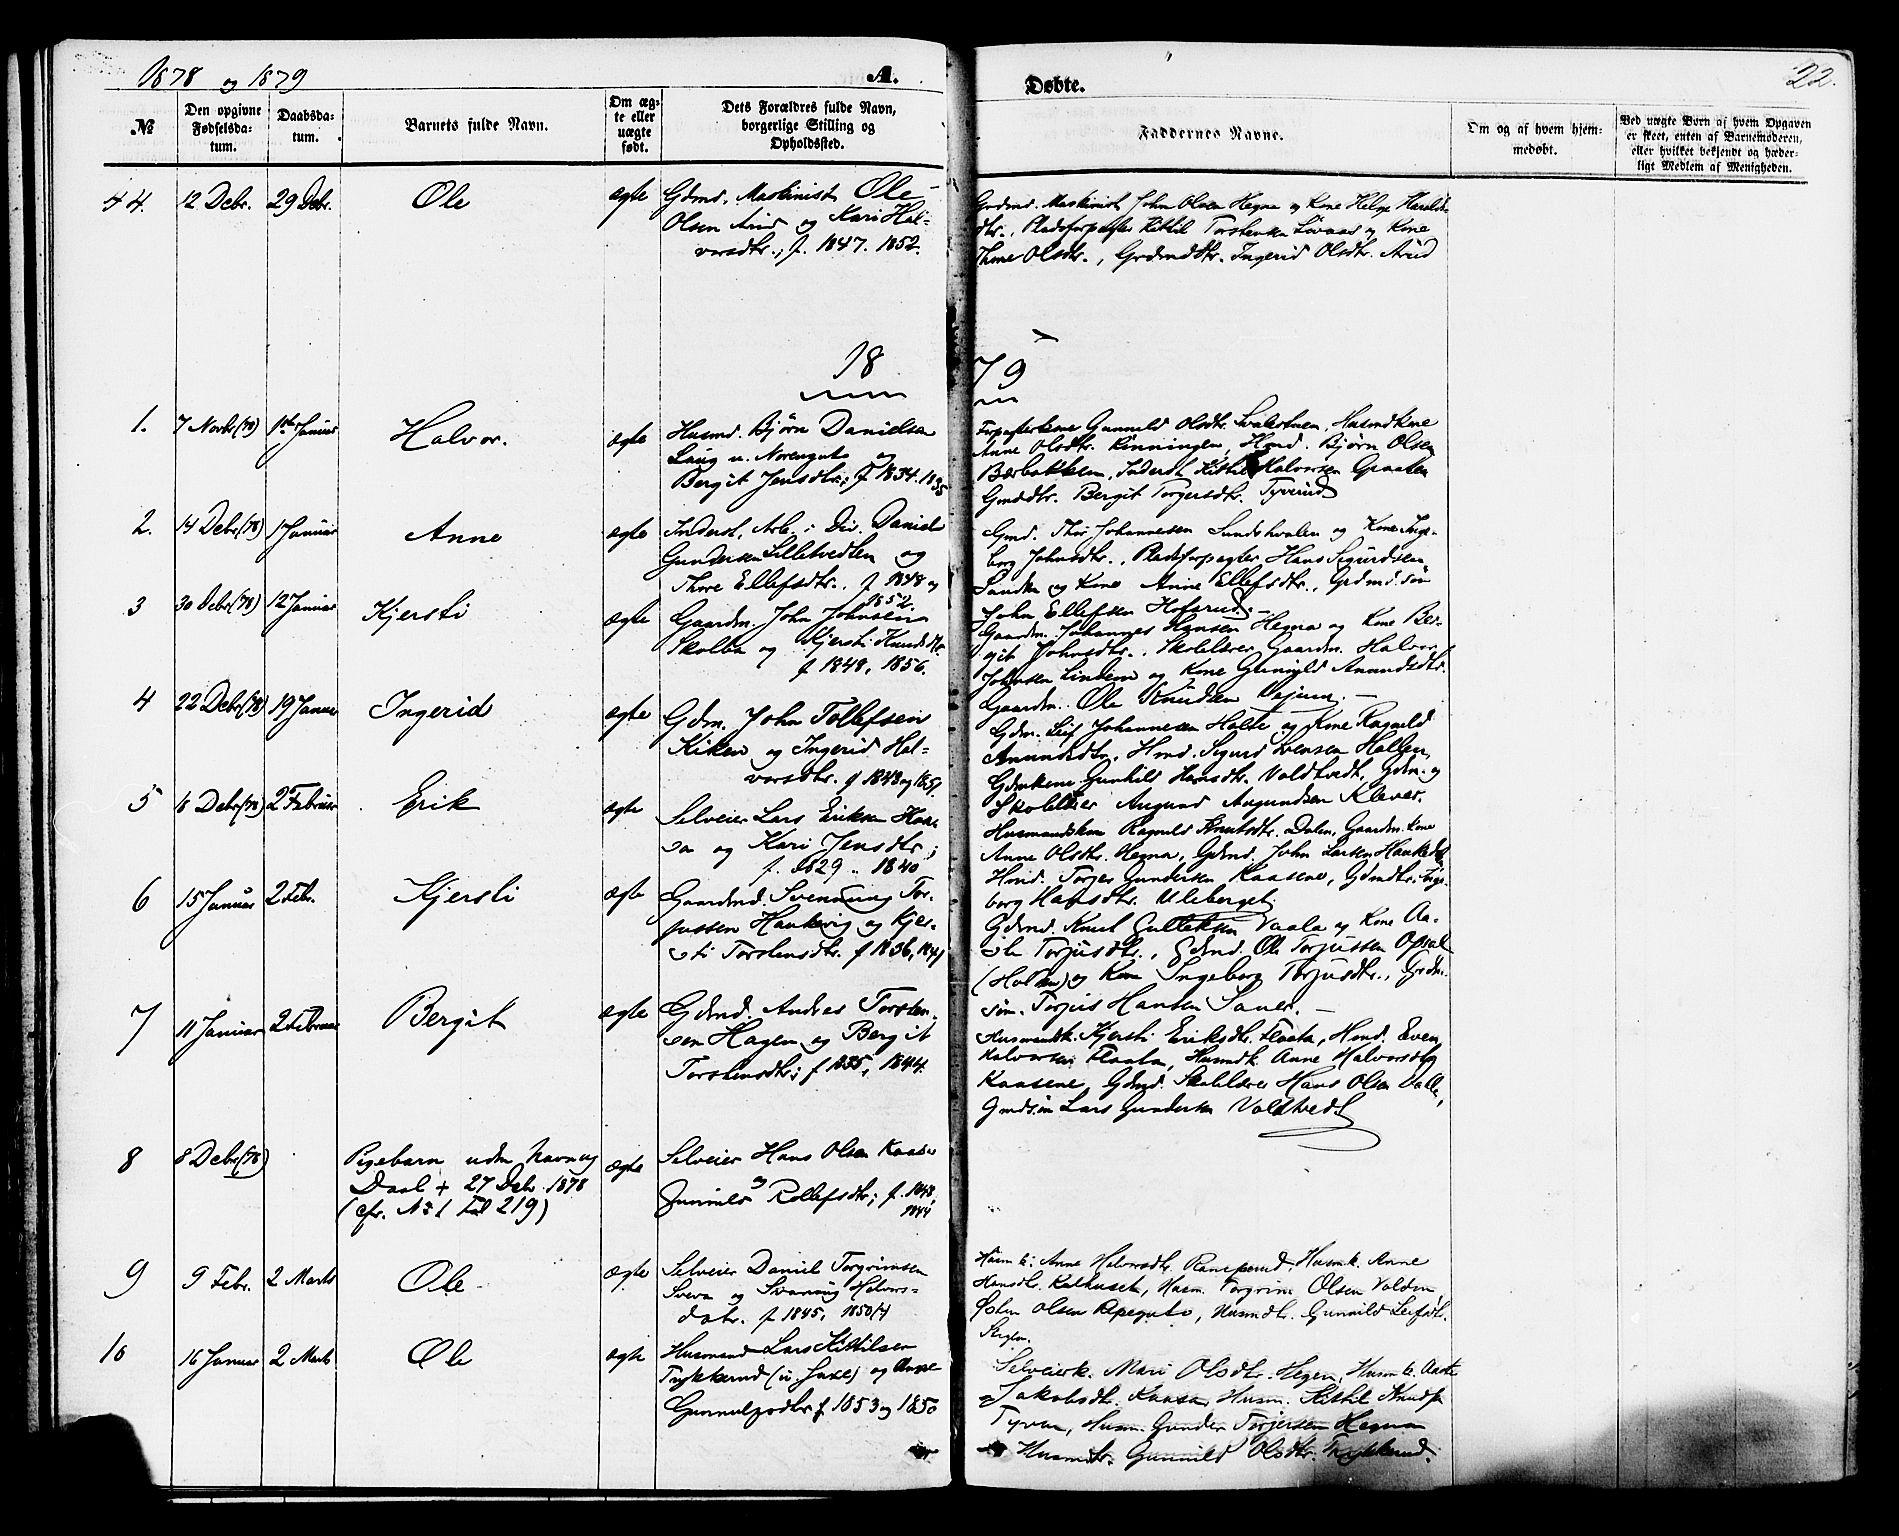 SAKO, Sauherad kirkebøker, F/Fa/L0008: Ministerialbok nr. I 8, 1873-1886, s. 22